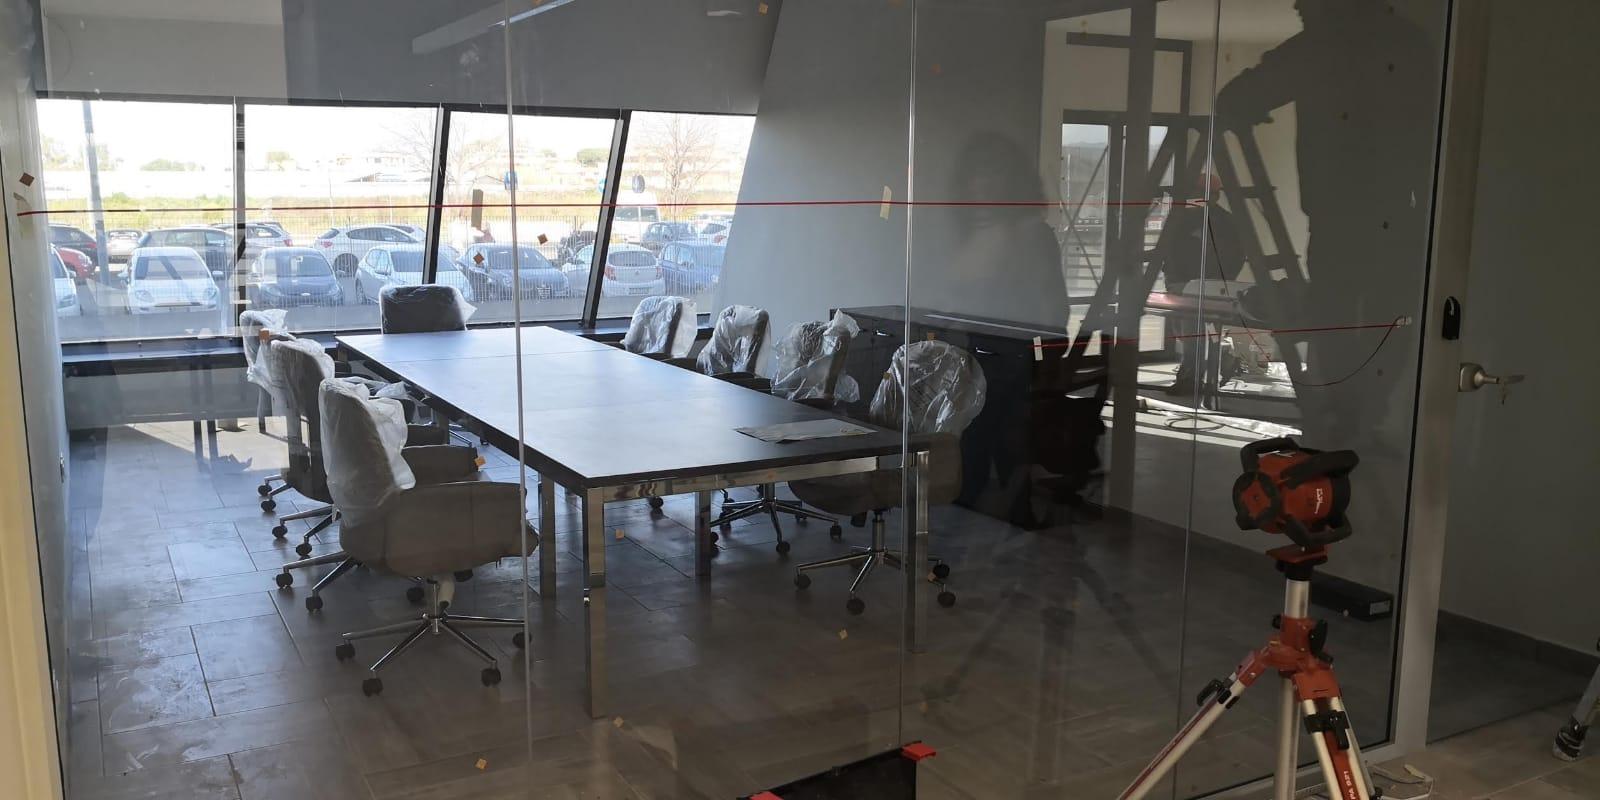 Arredamento_e_ristrutturazione_aziendale_GruppoPscSpa_GruppoSmau (9)